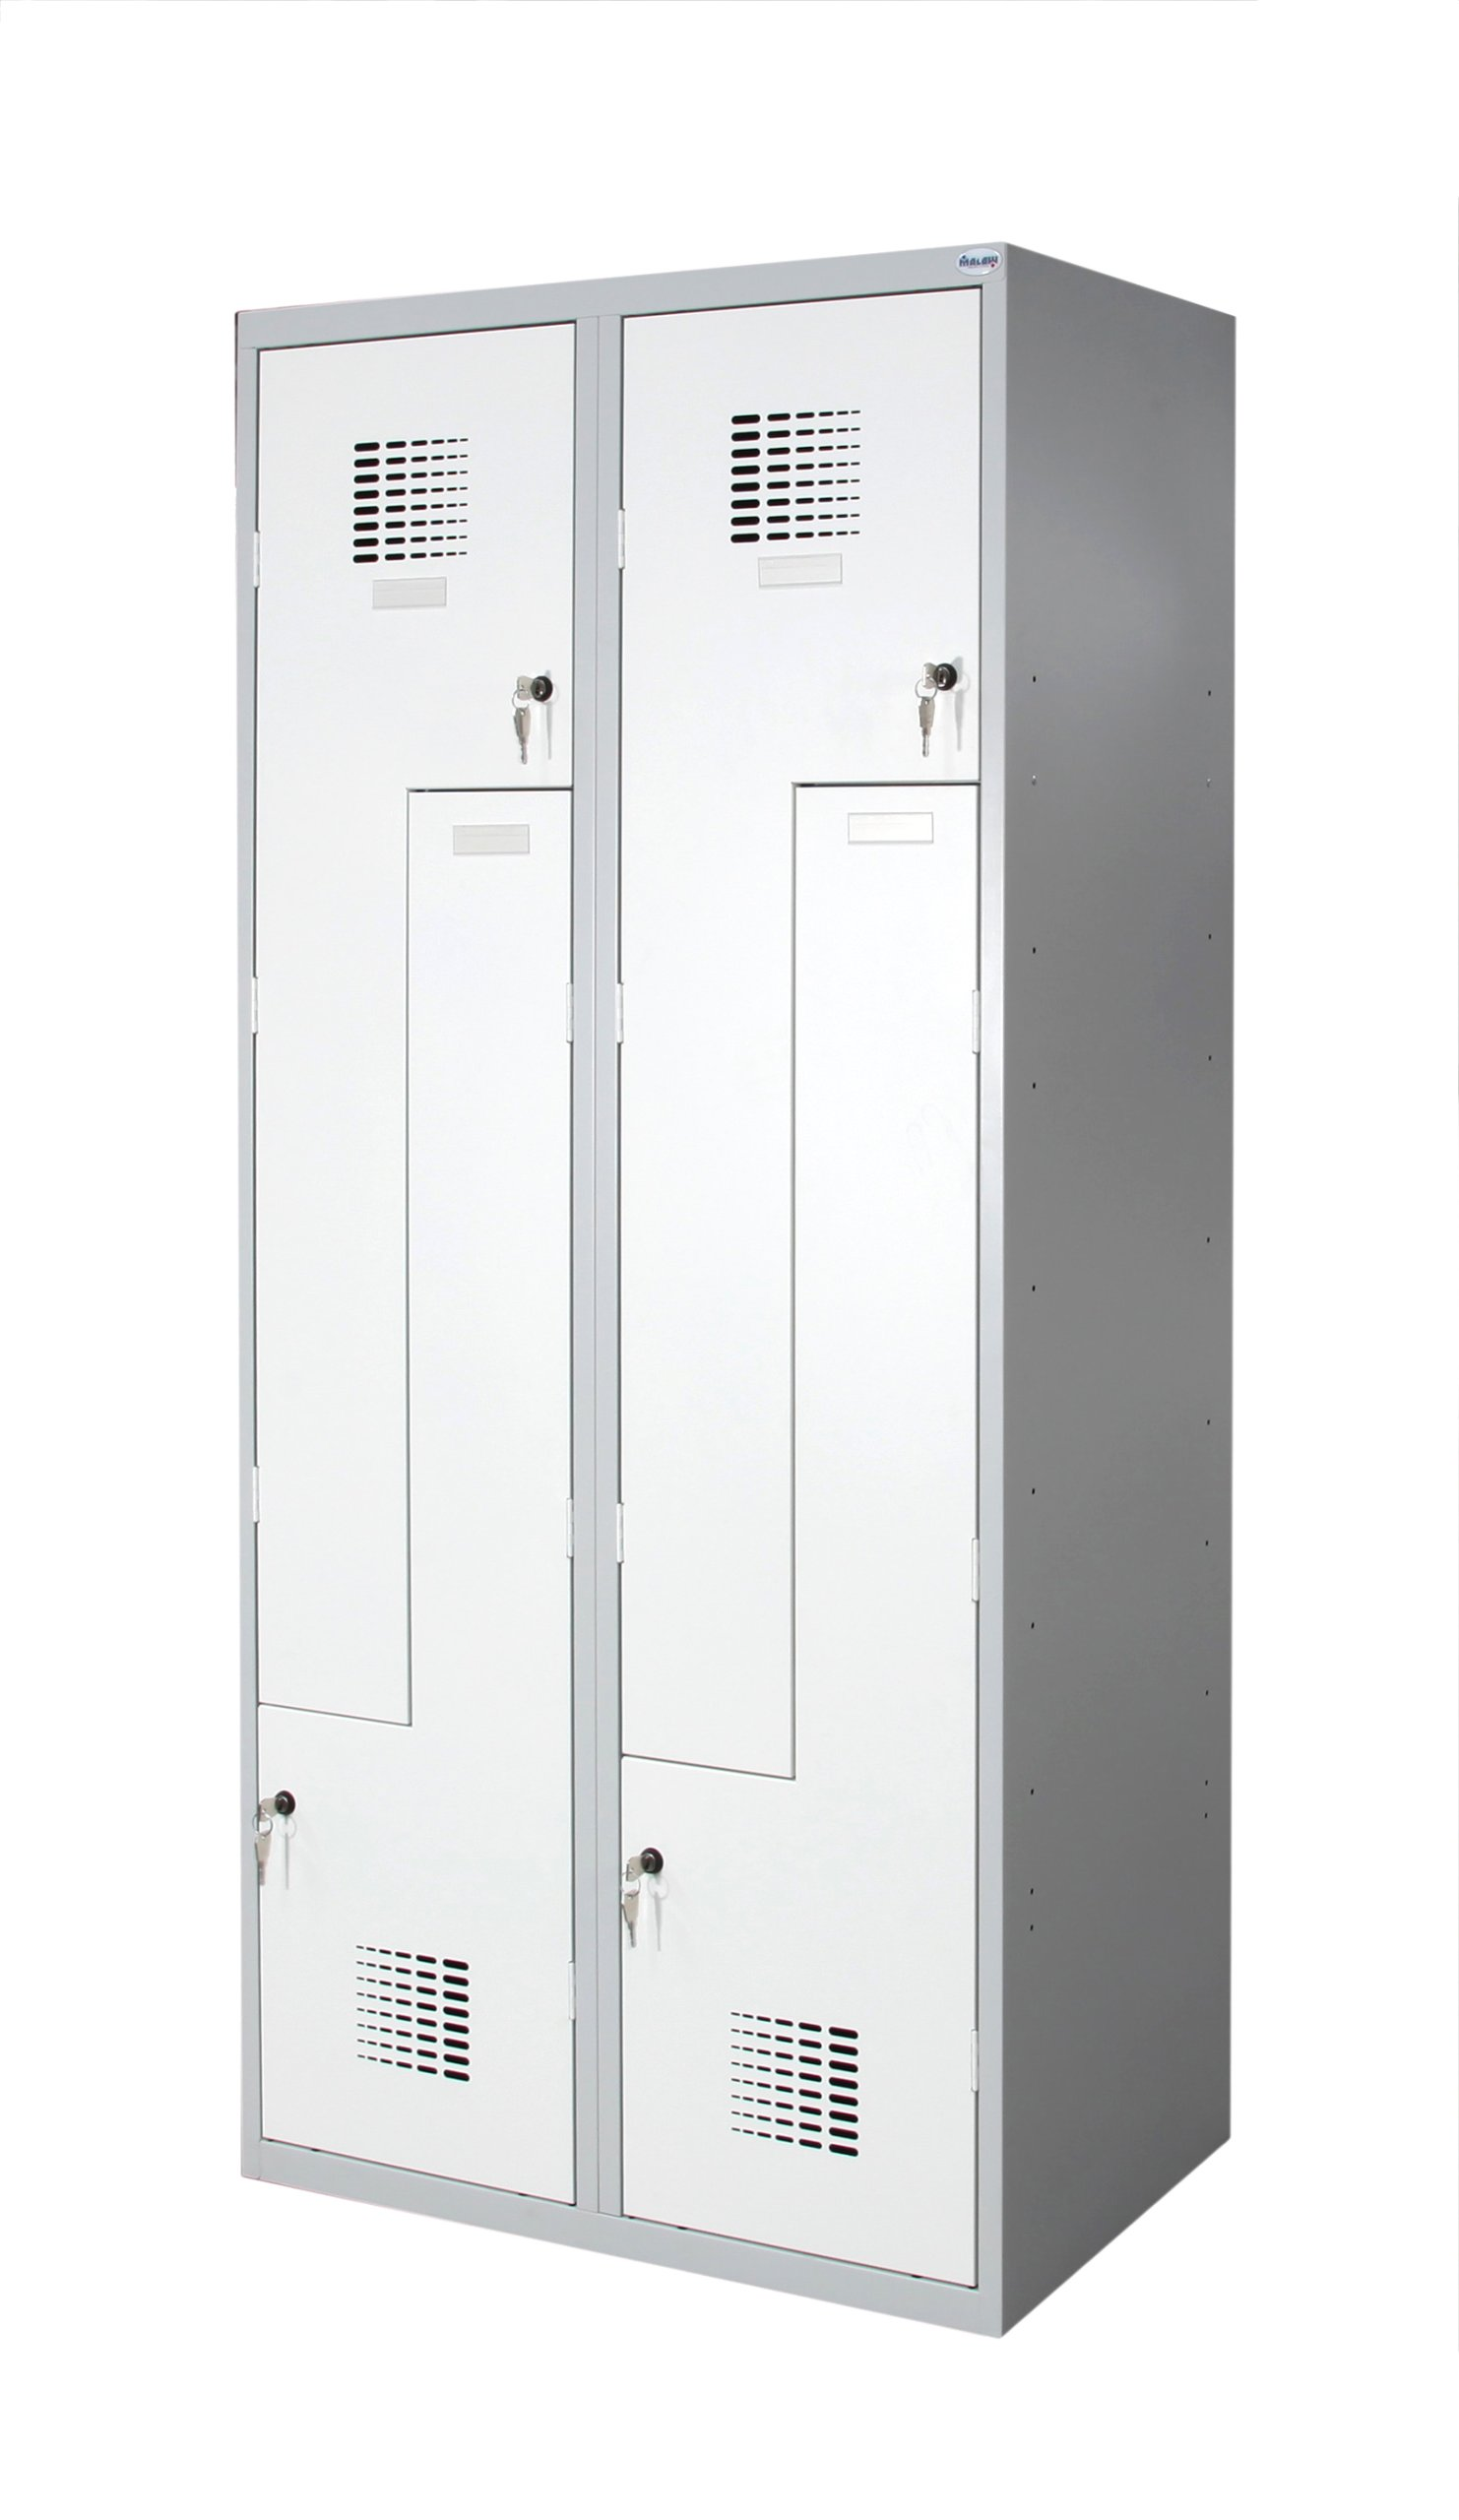 Шкаф металлический шкаф ??? одежды Sul 42W мебелью охране ТРУДА